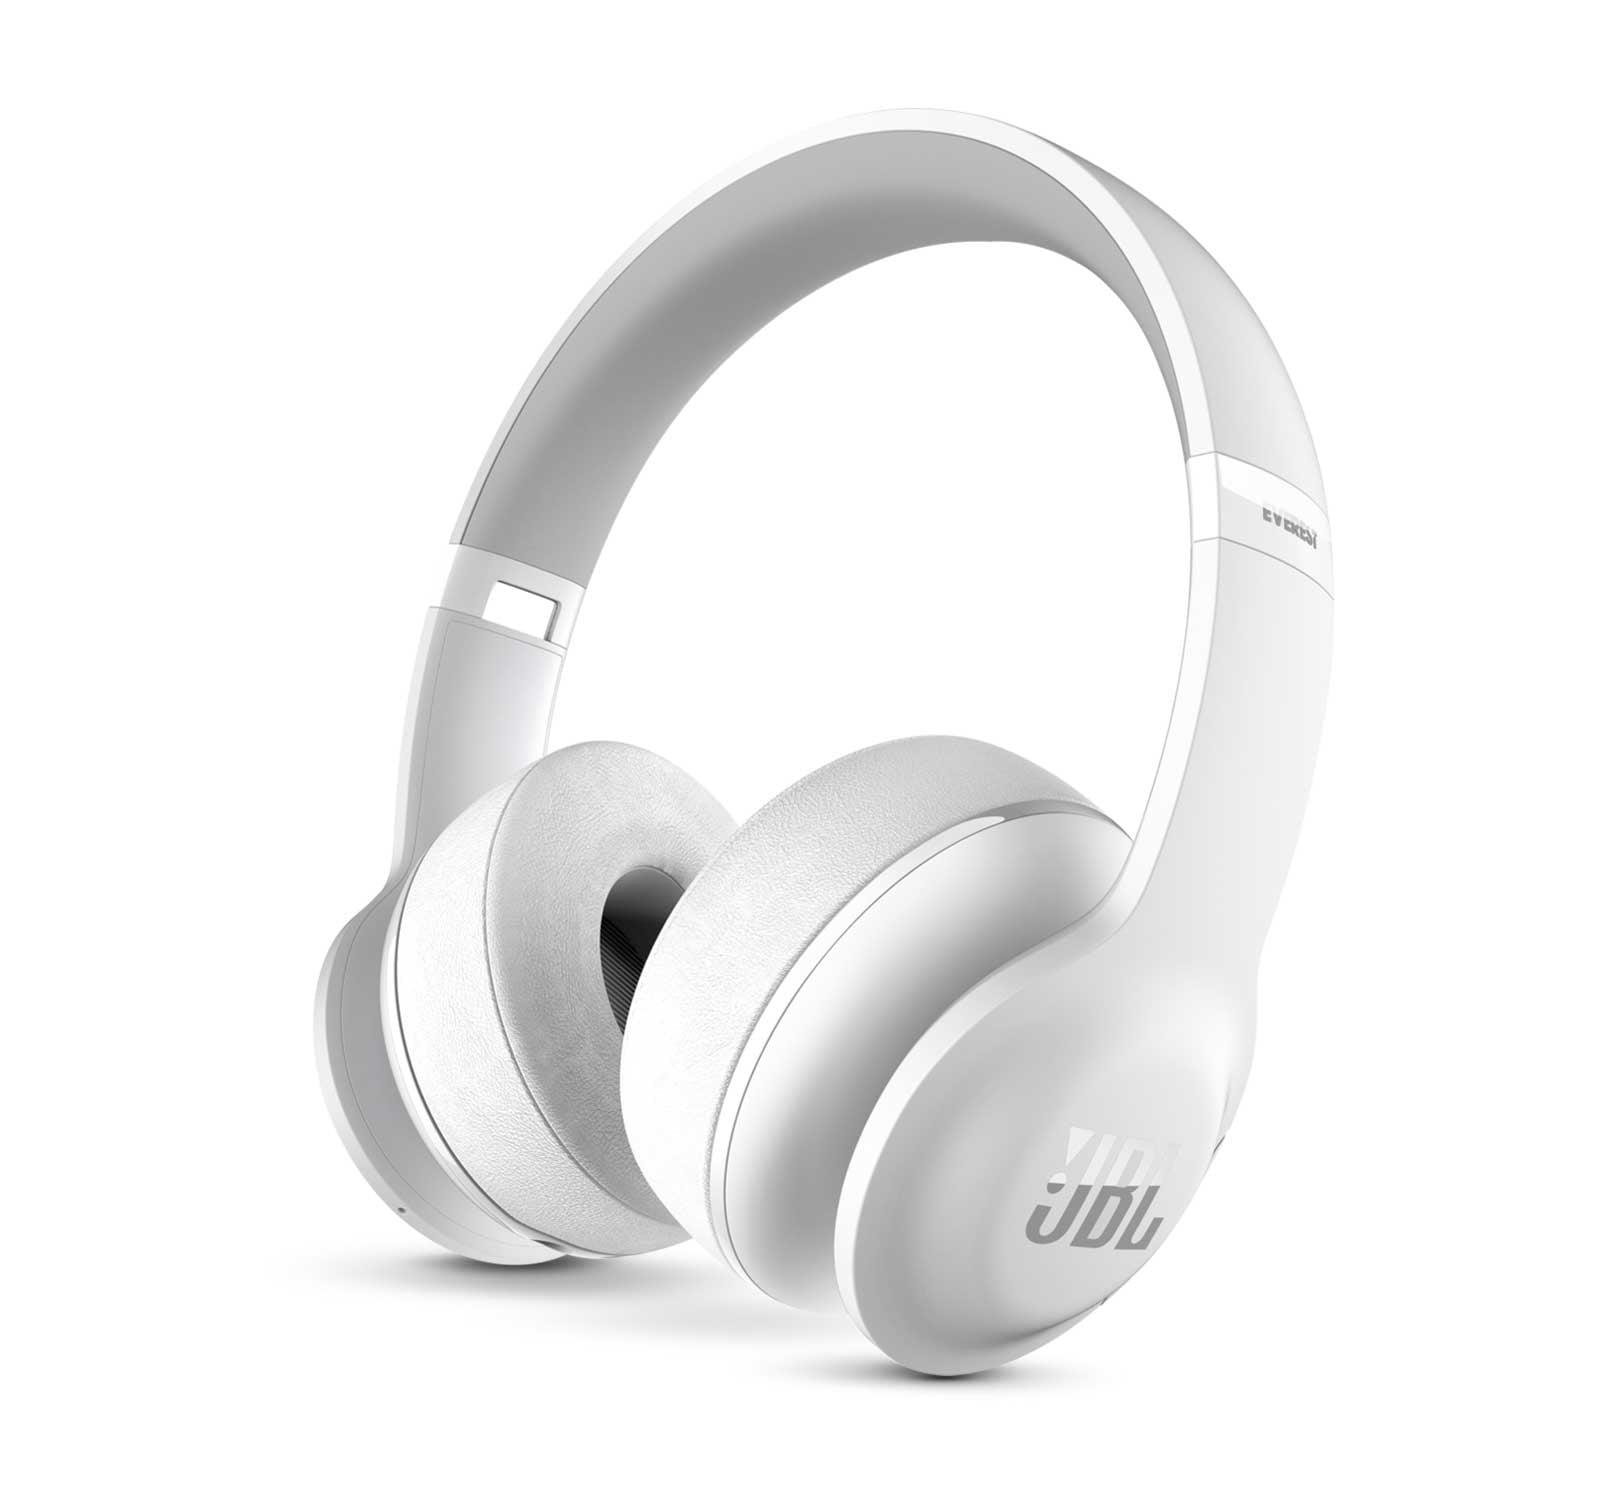 Jbl Everest 300 White Open Box On Ear Wireless Bluetooth Headphones Walmart Com Walmart Com